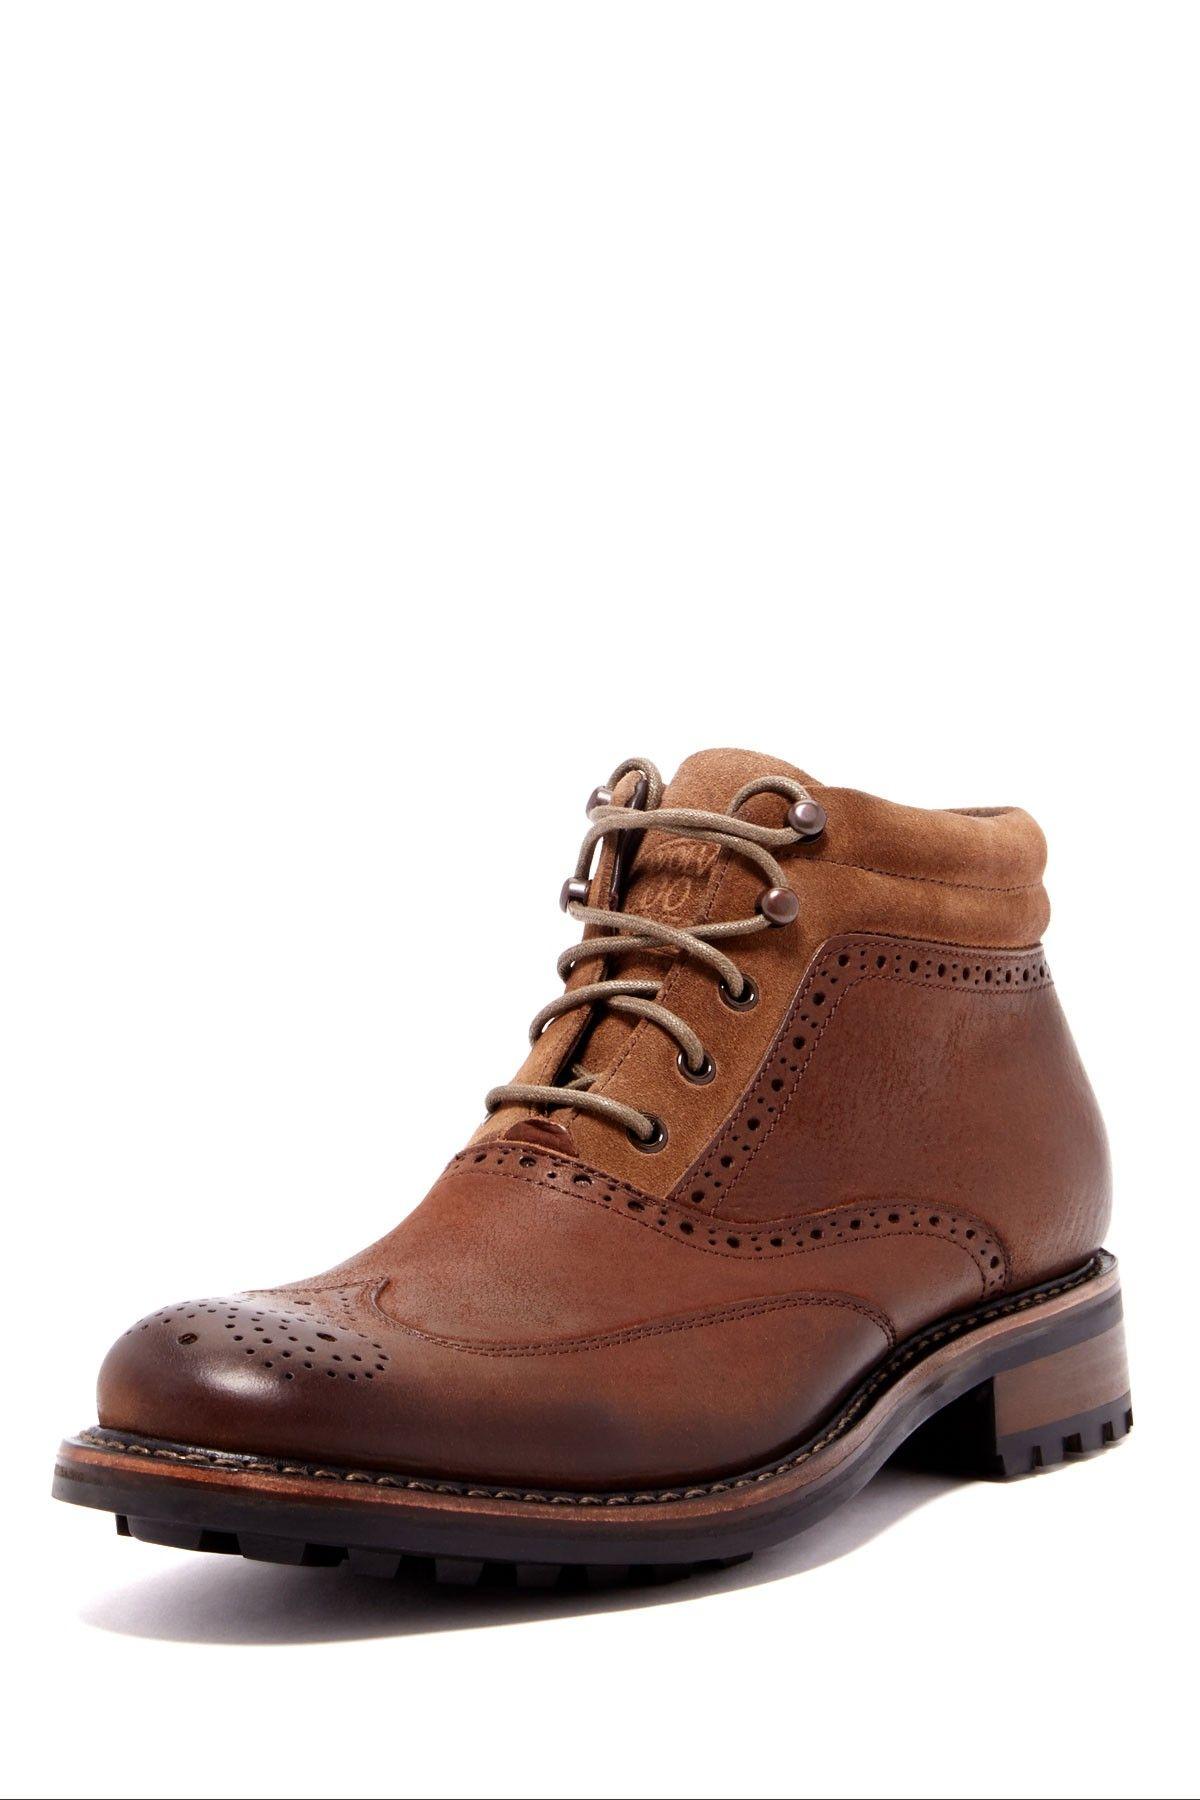 Wolverine 1000 Mile Wyatt 1000 Mile Chukka Chukka  Lace-upMen  Shoes ... 4d0a51baa0